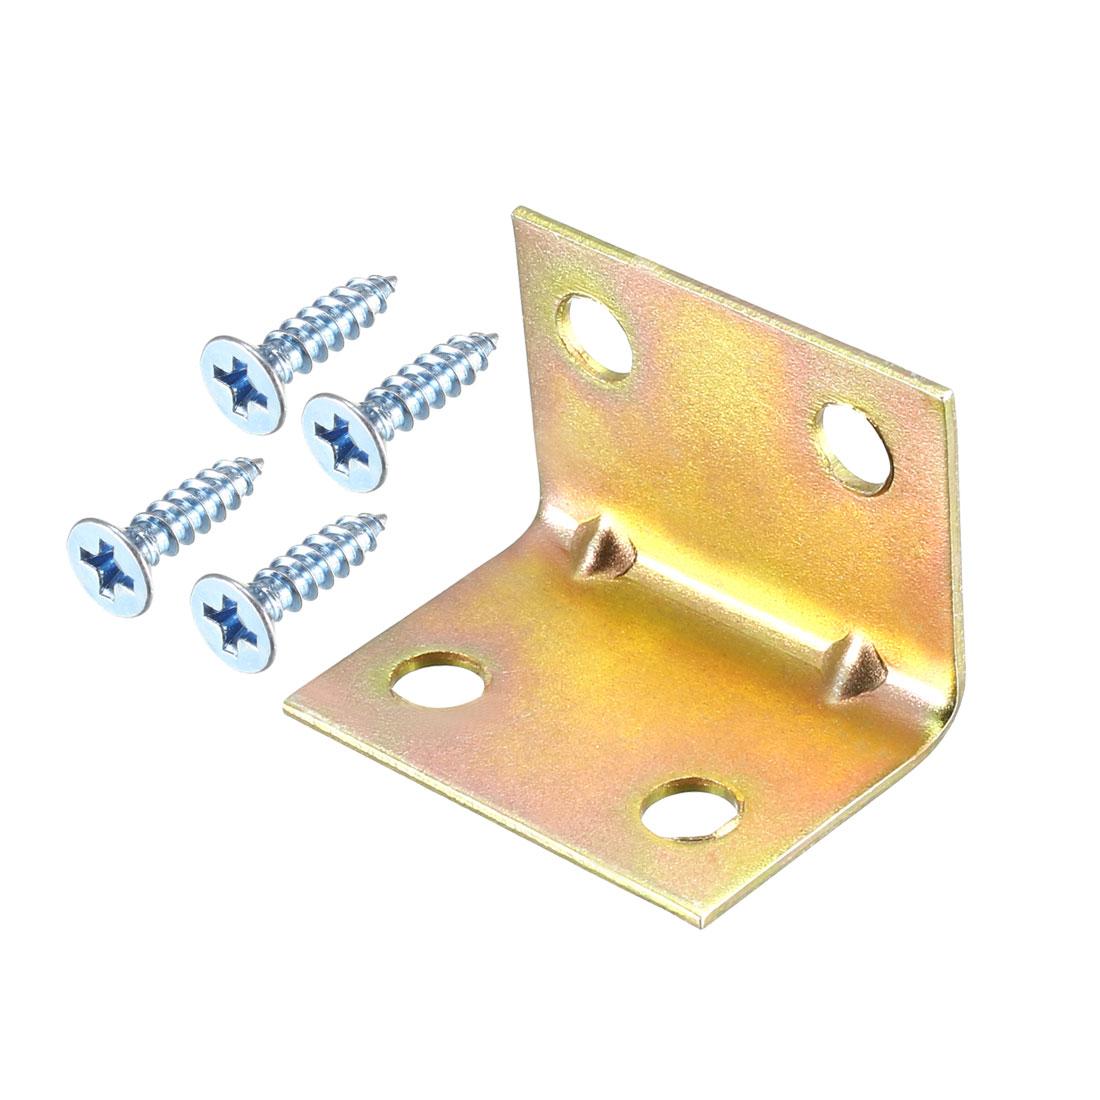 Corner Brace, 18mm x 24mm x 18mm Zinc Plated Angle Bracket with Screws, 20 Pcs